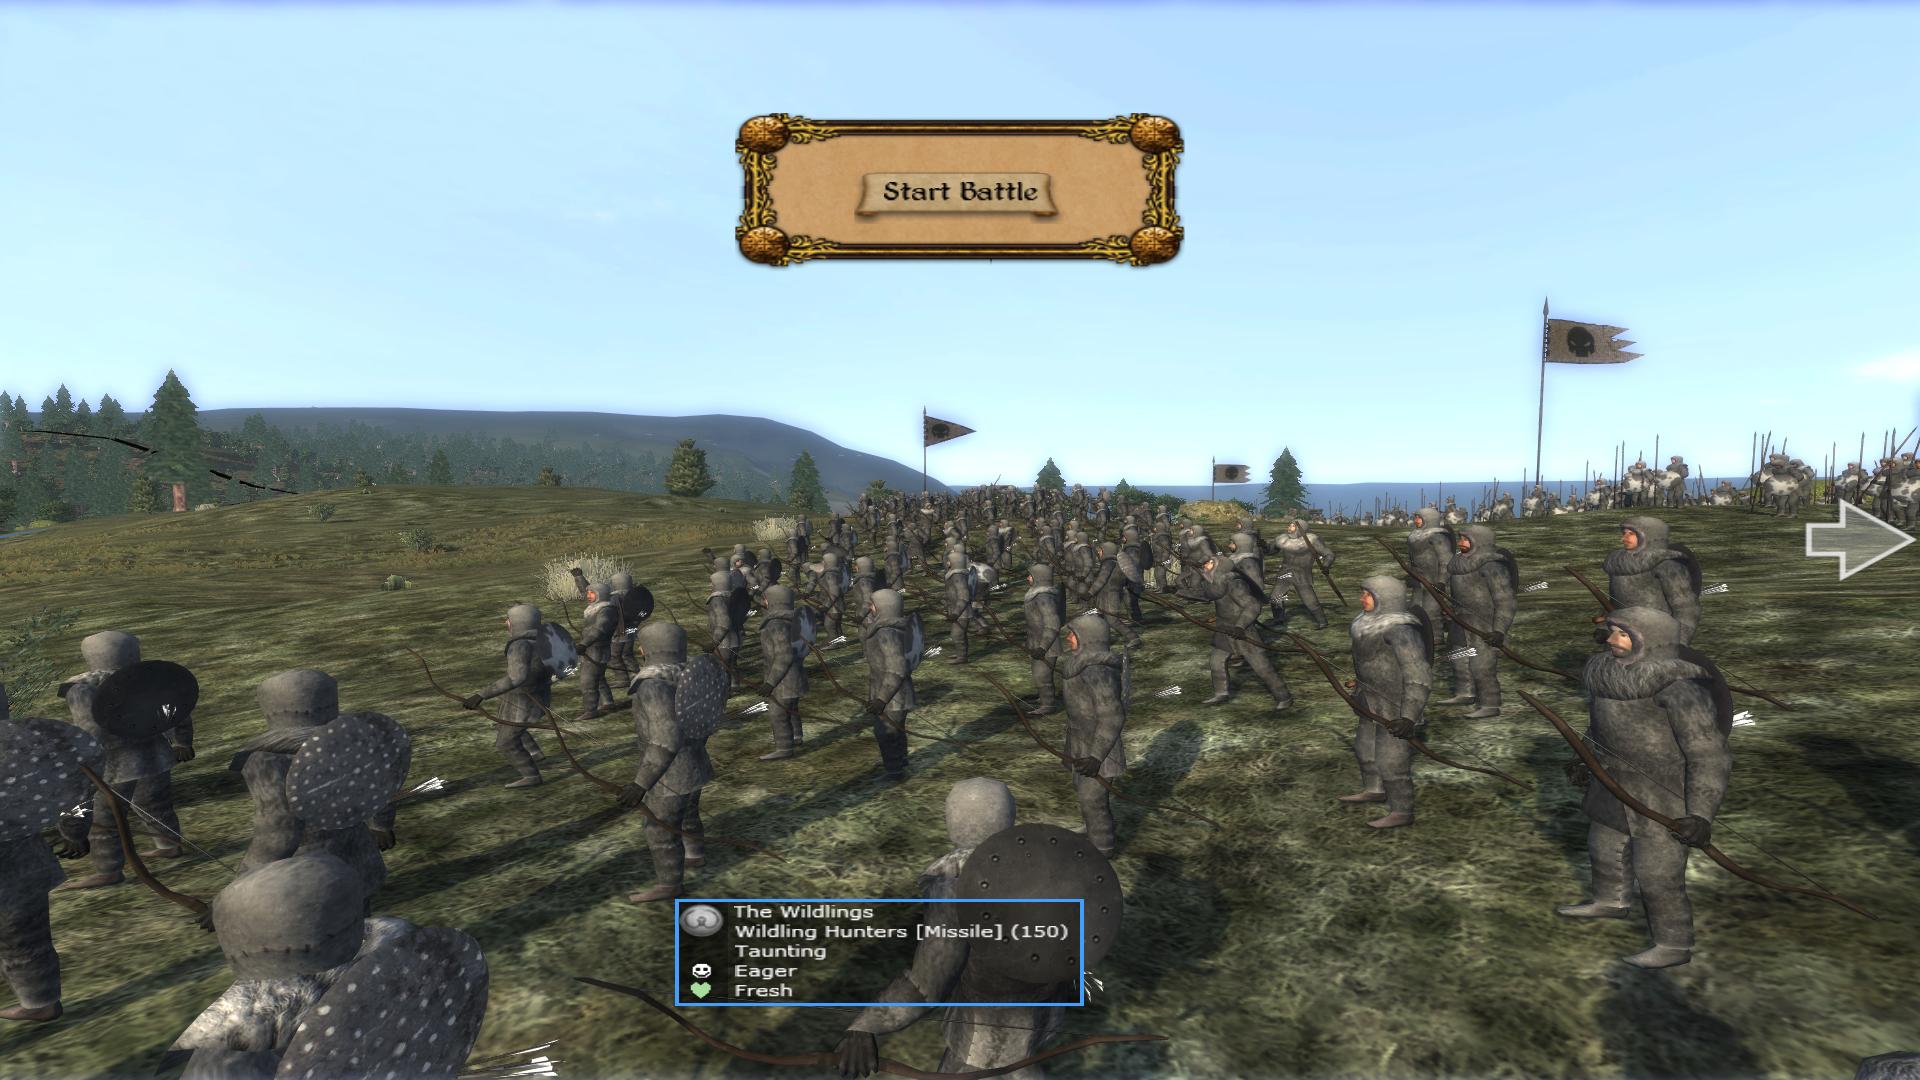 Wildling Hunters (Bowmen)